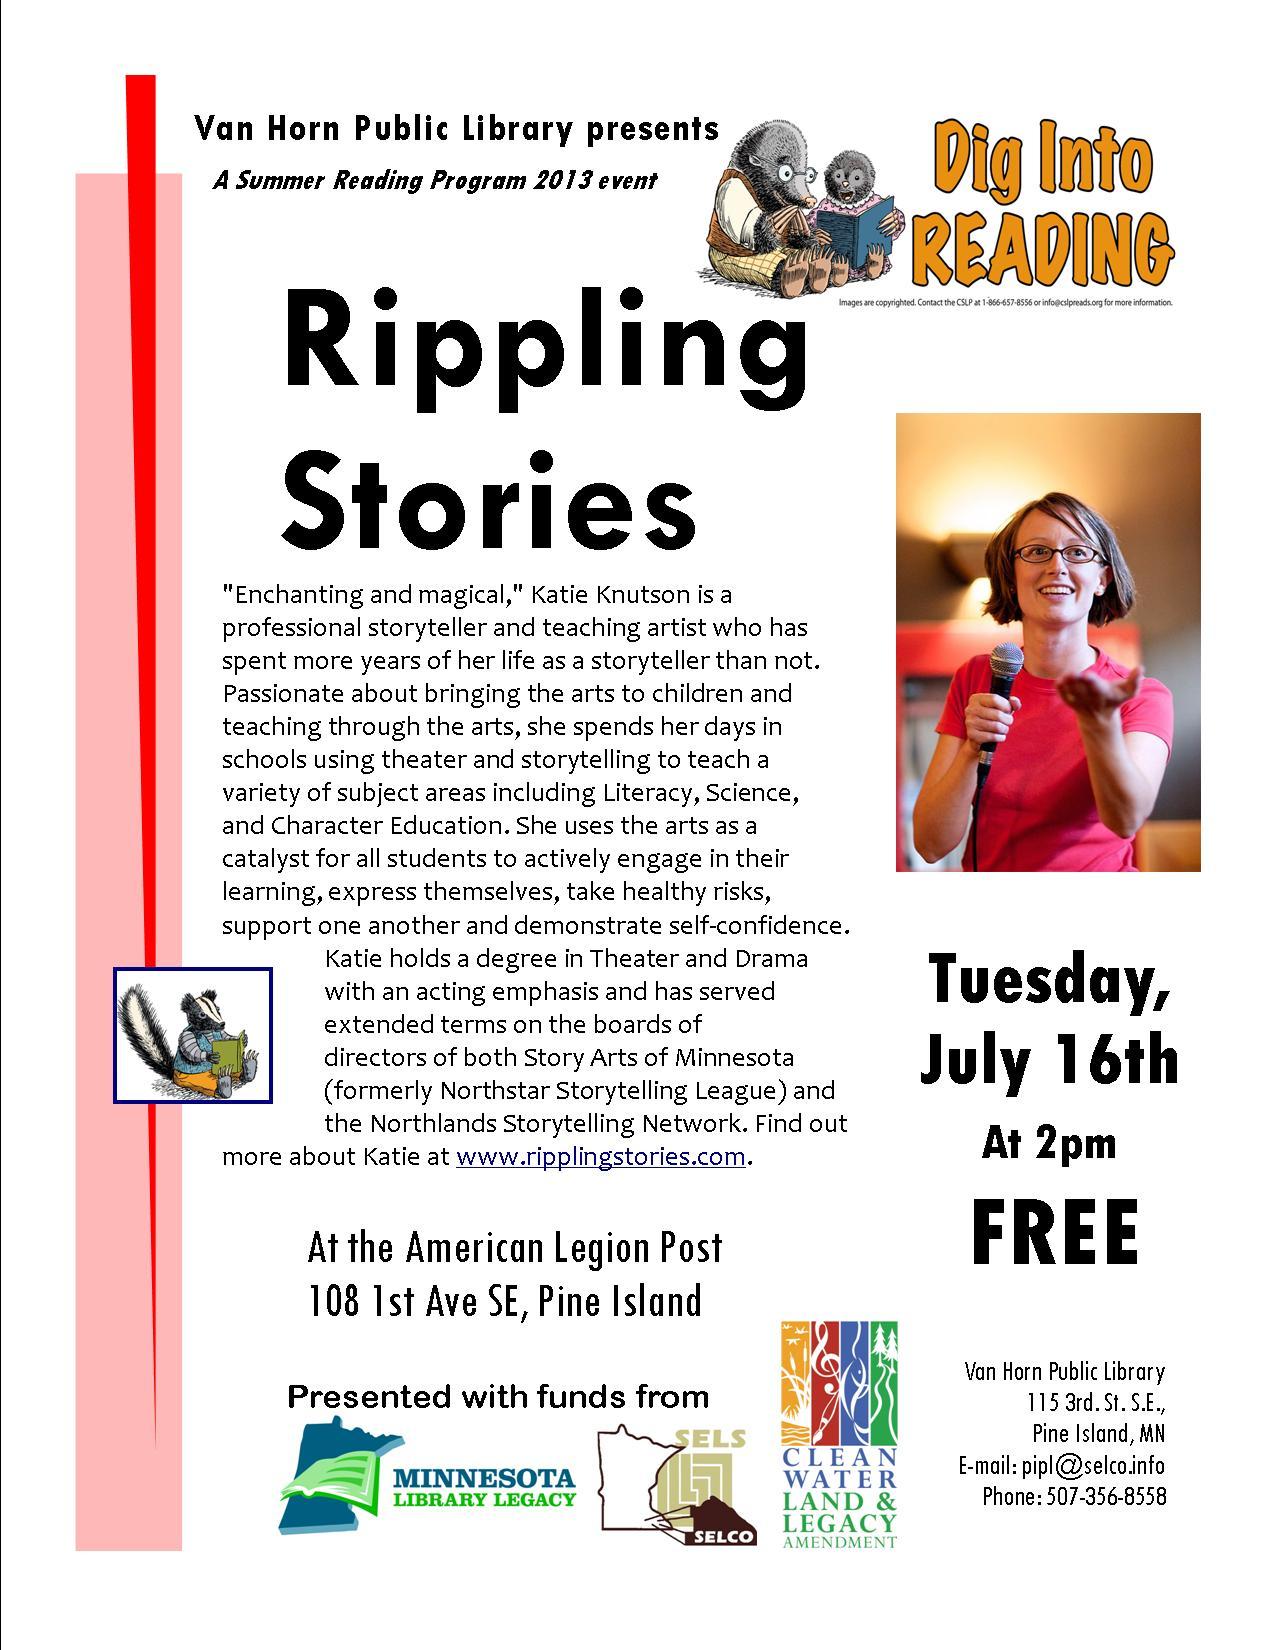 Rippling Stories flyer